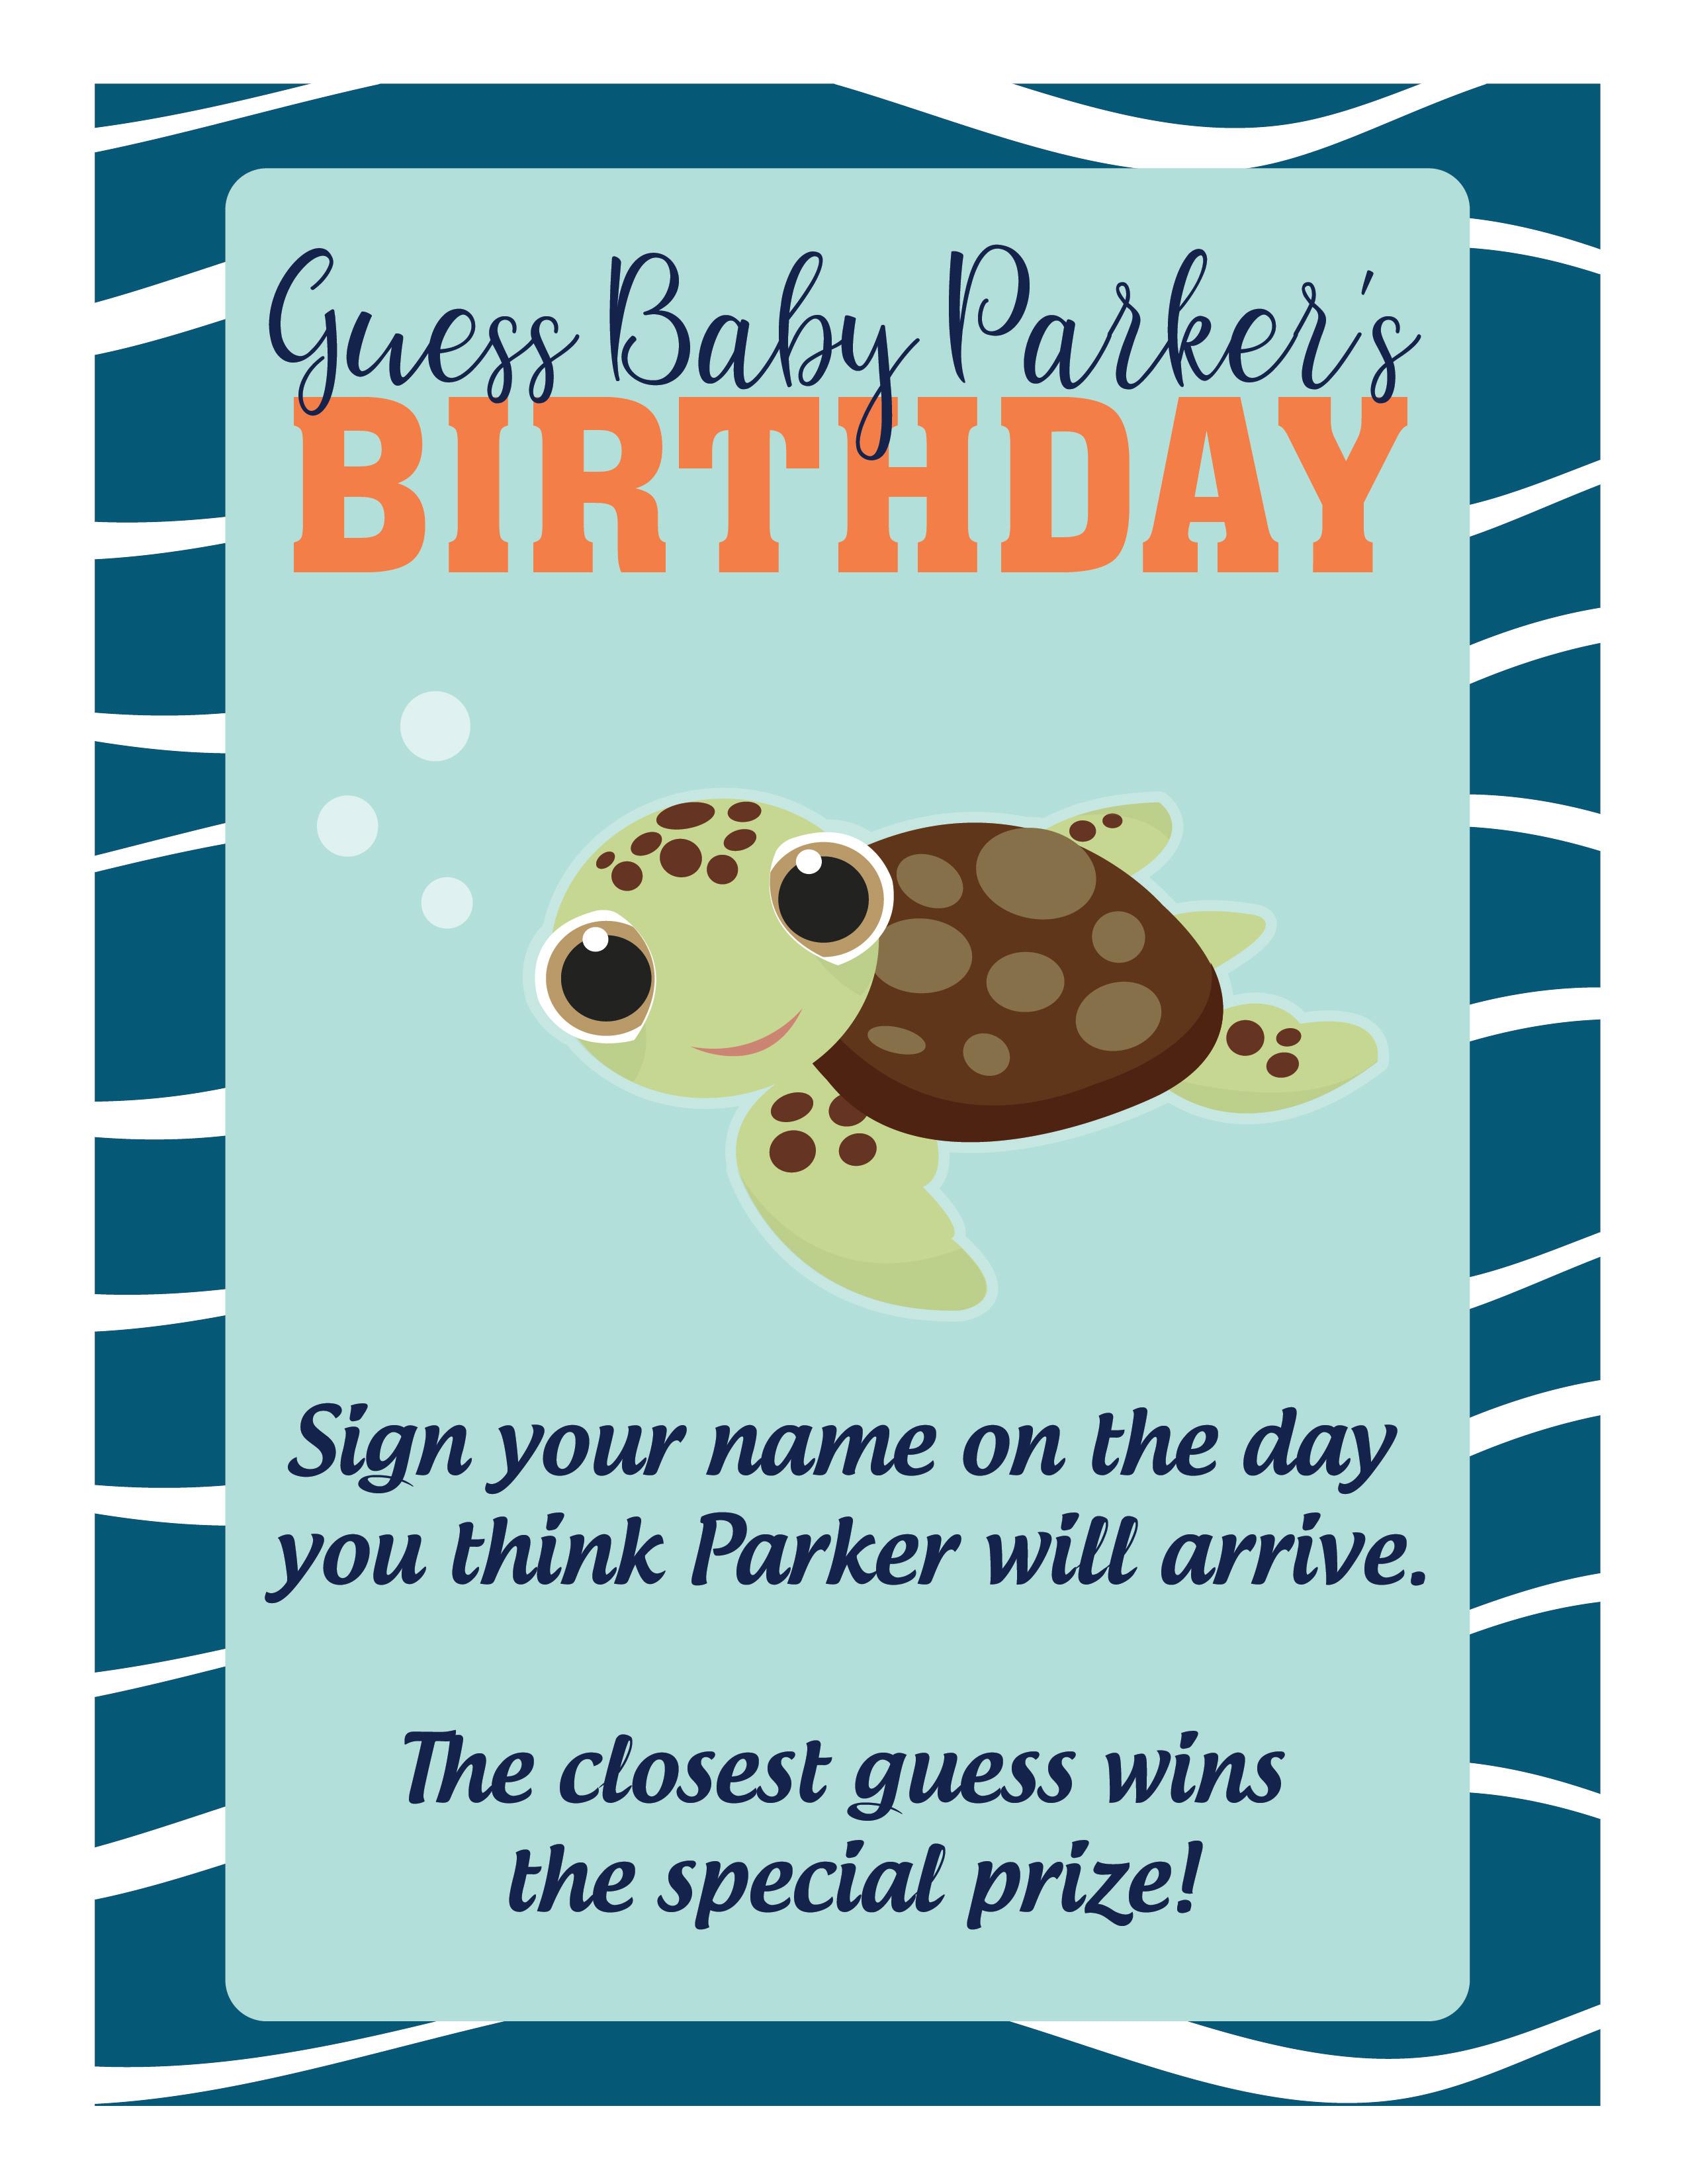 Baby Shower_Calendar Sign 2018